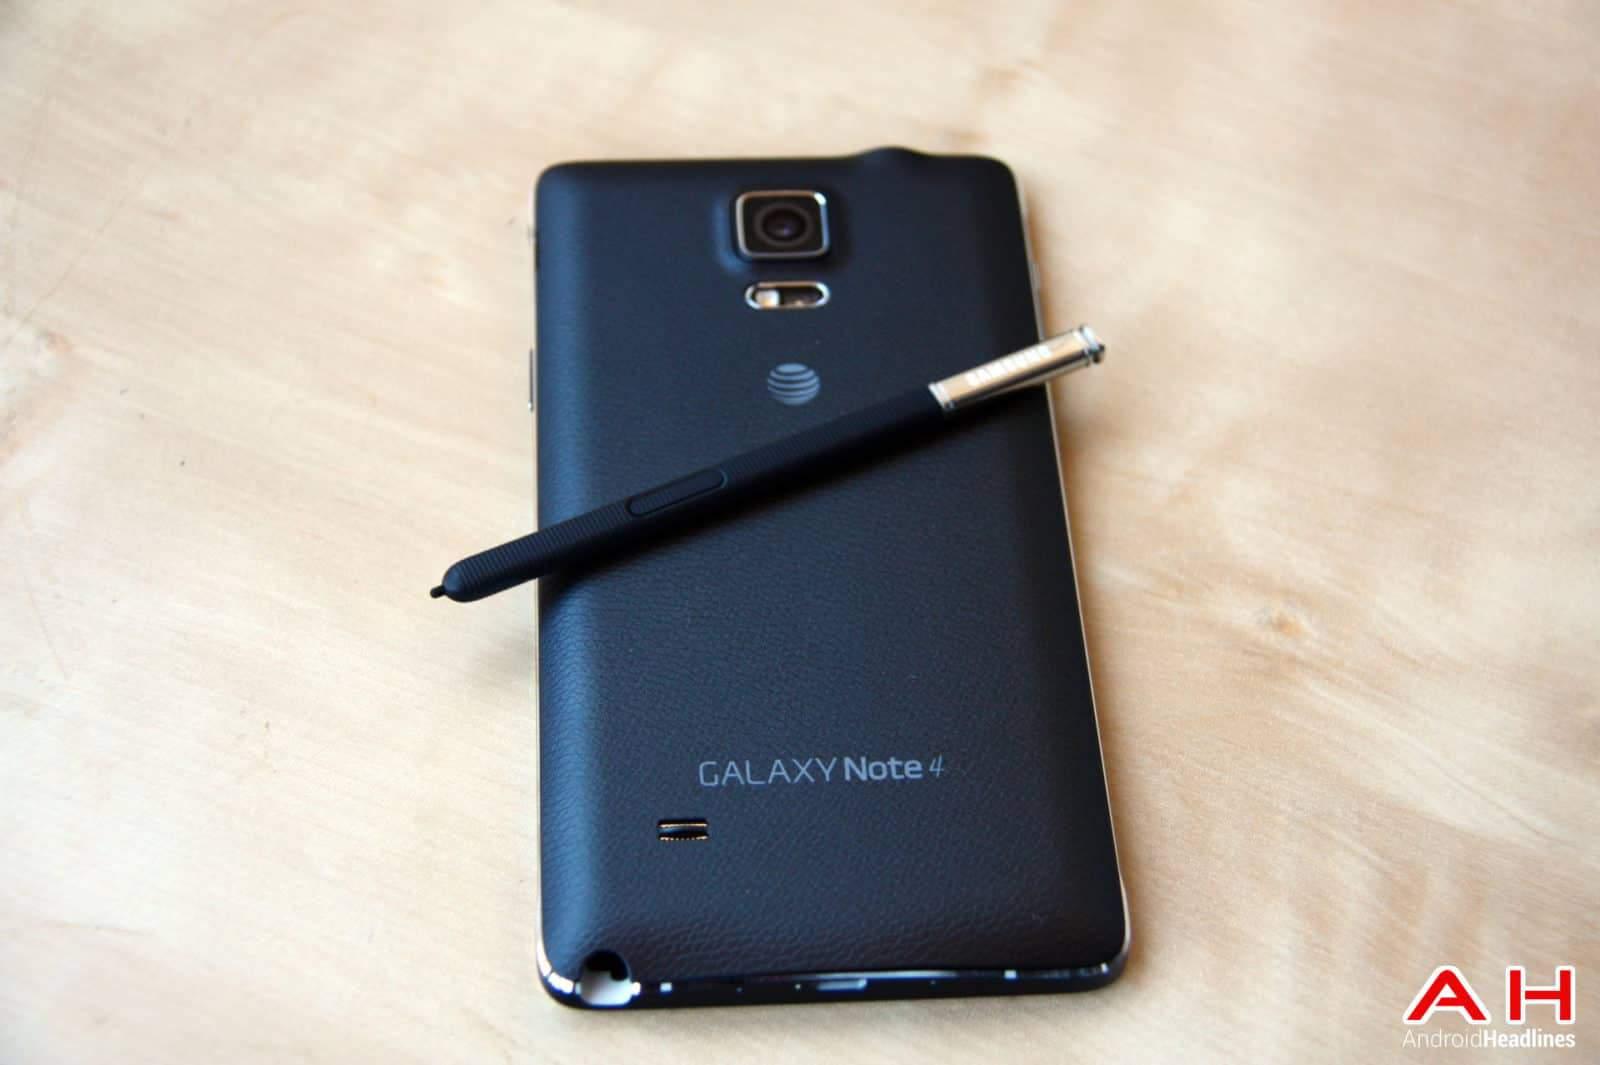 AH Samsung Galaxy Note 4 - 7